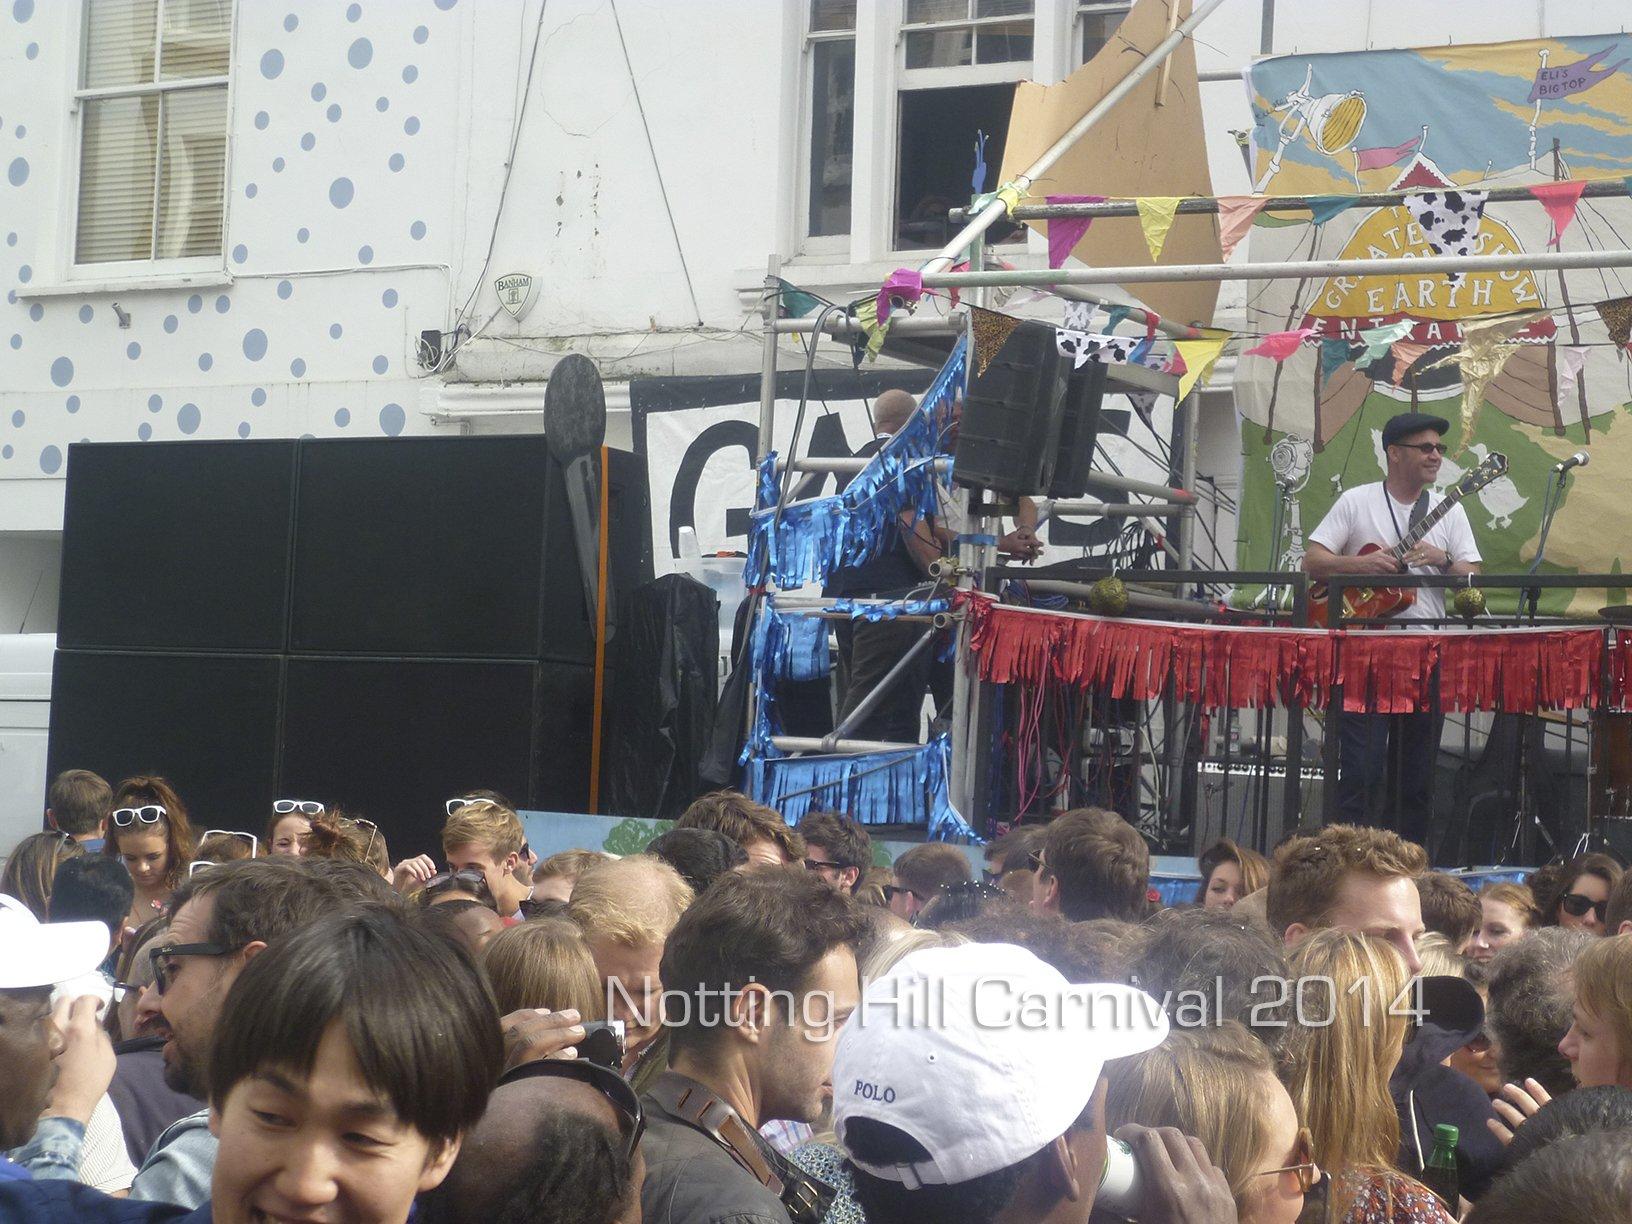 Notting-Hill-Carnival-2014-Street-Sound-System-6